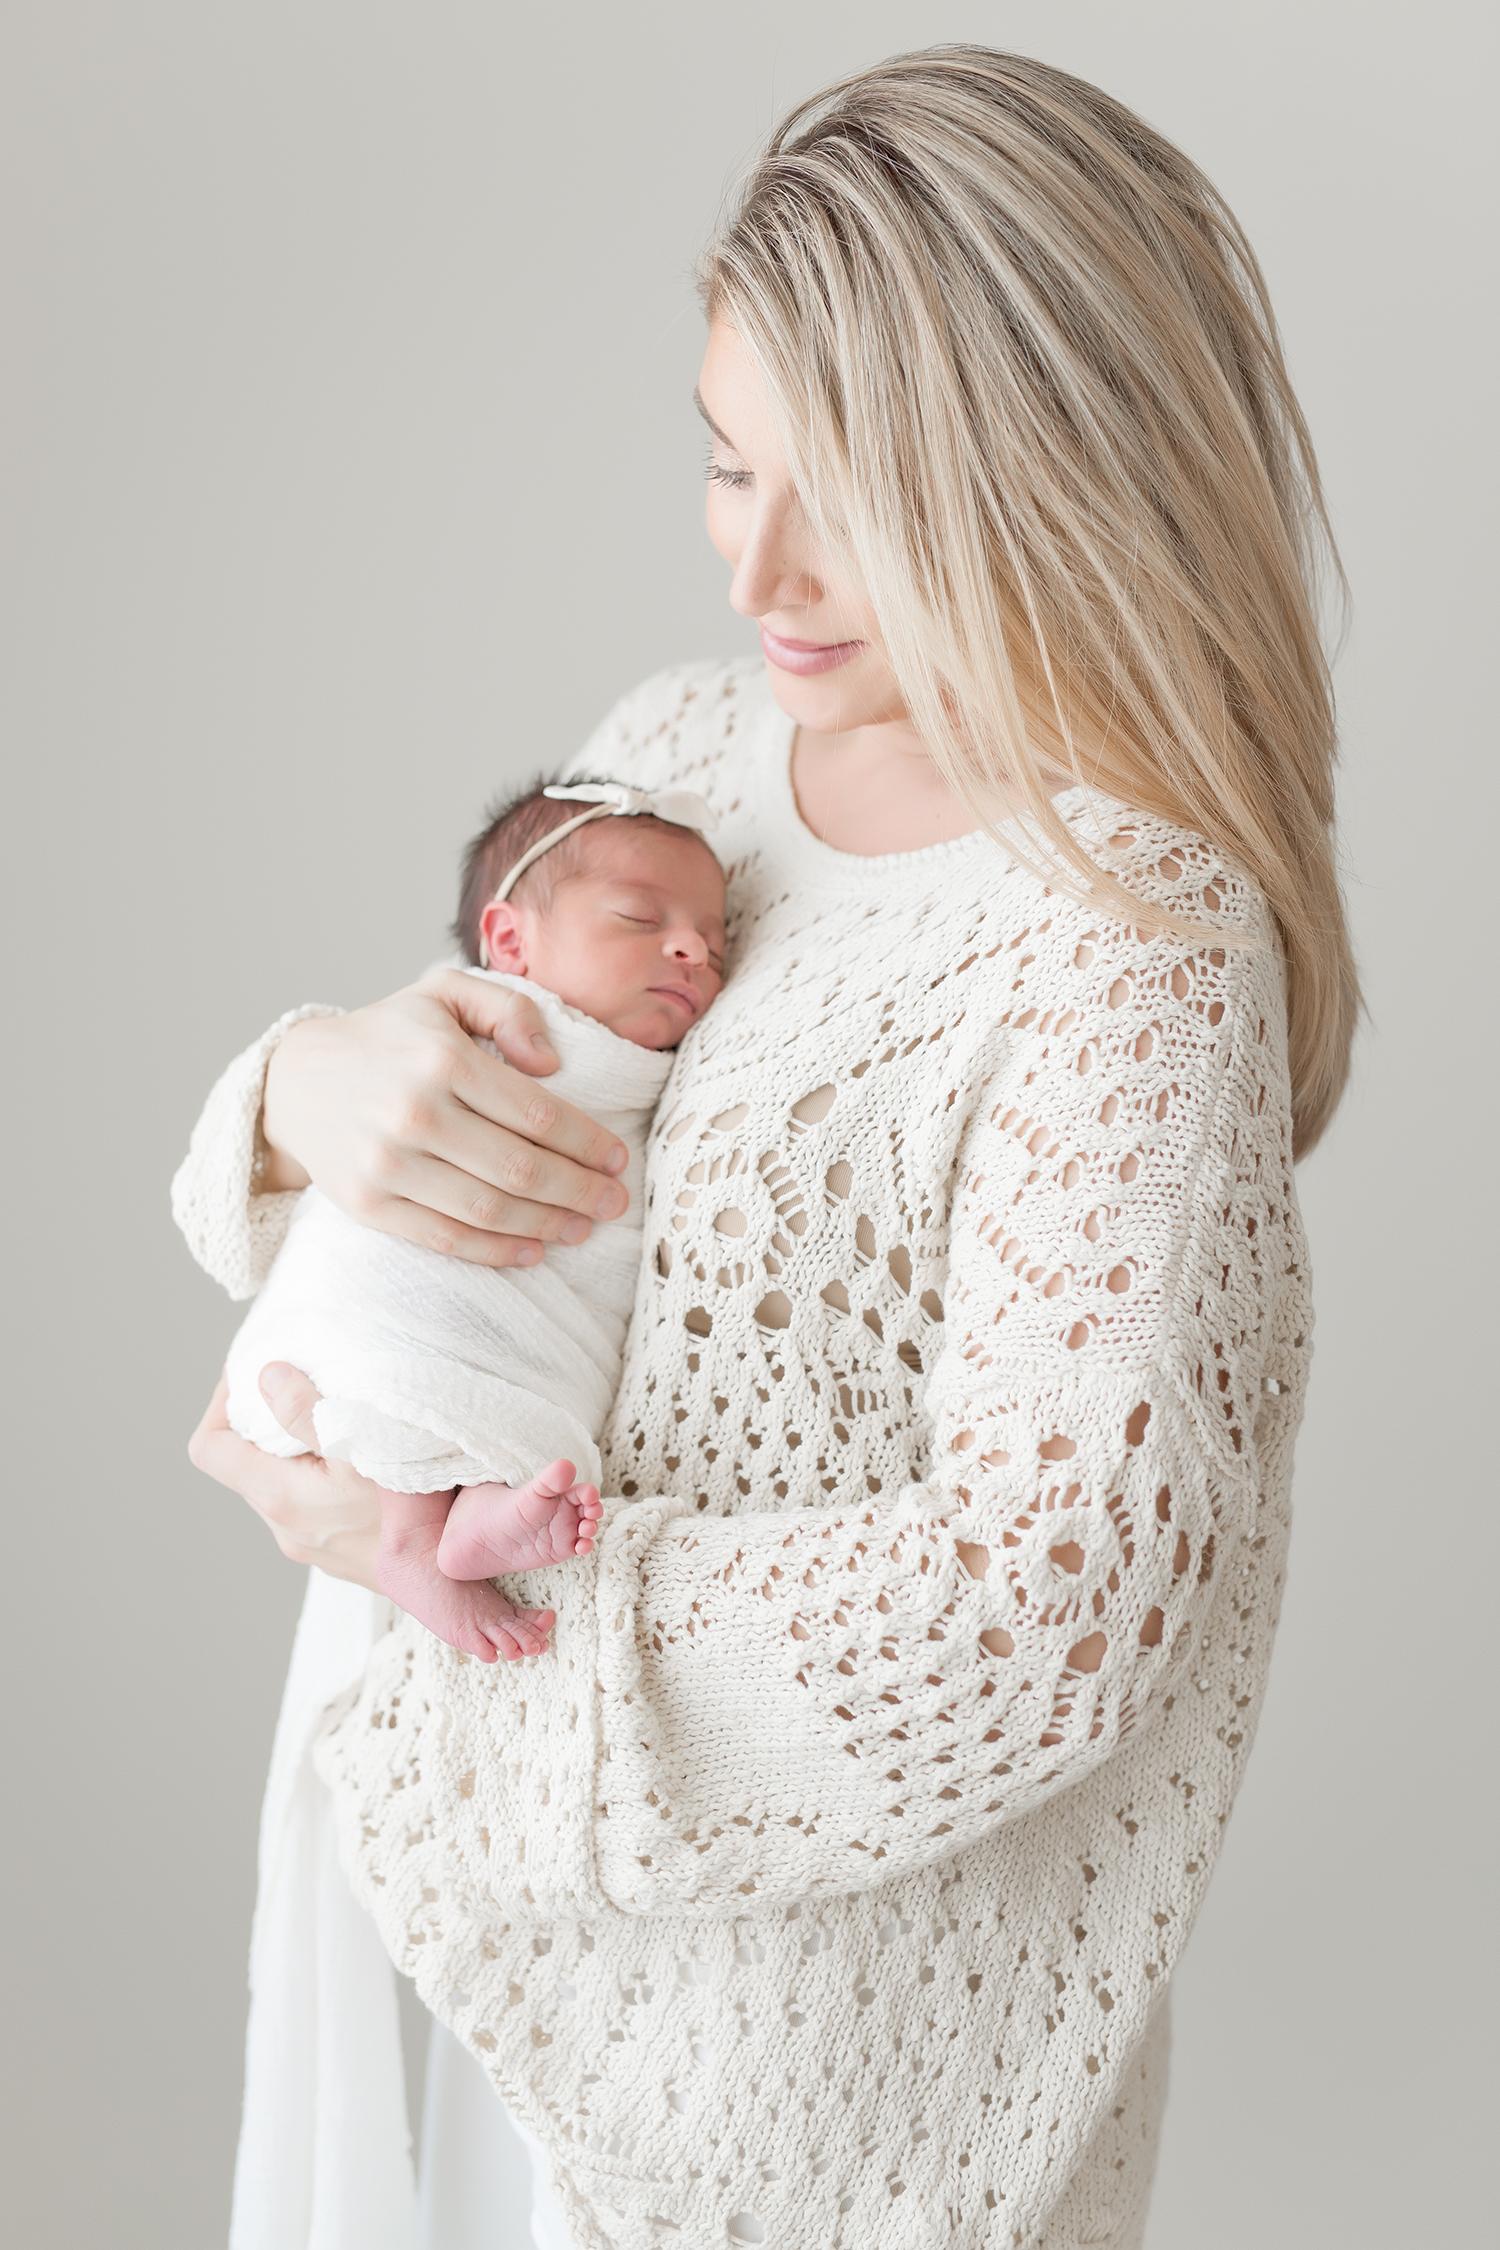 Northern-VA-Newborn-Photographer-49.jpg